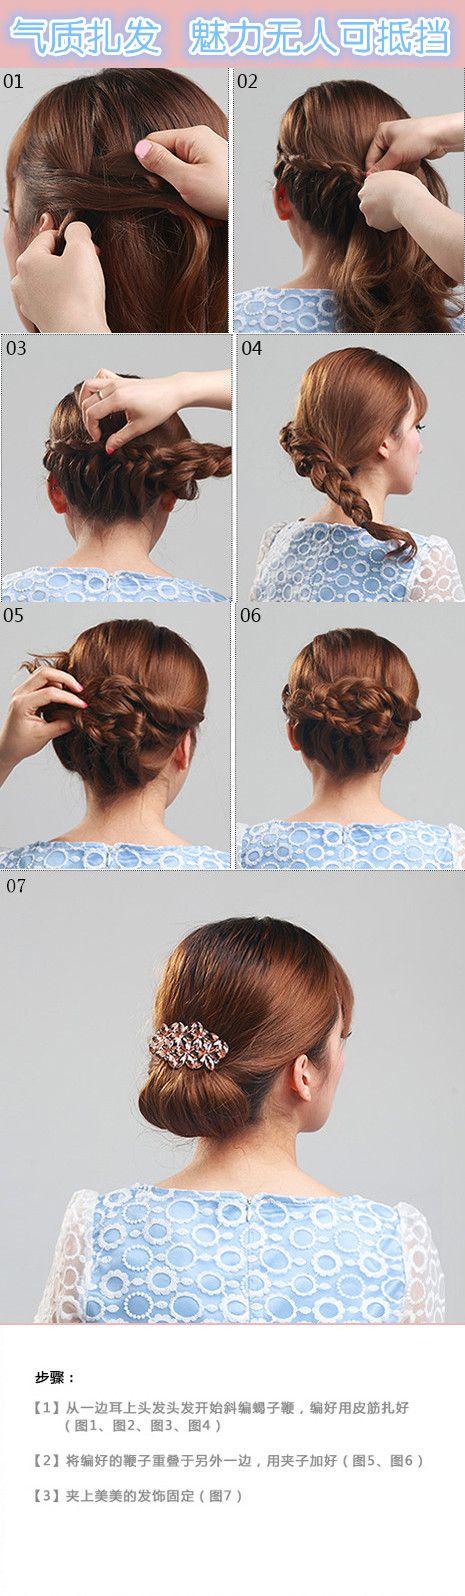 braided hairstyle tutorial